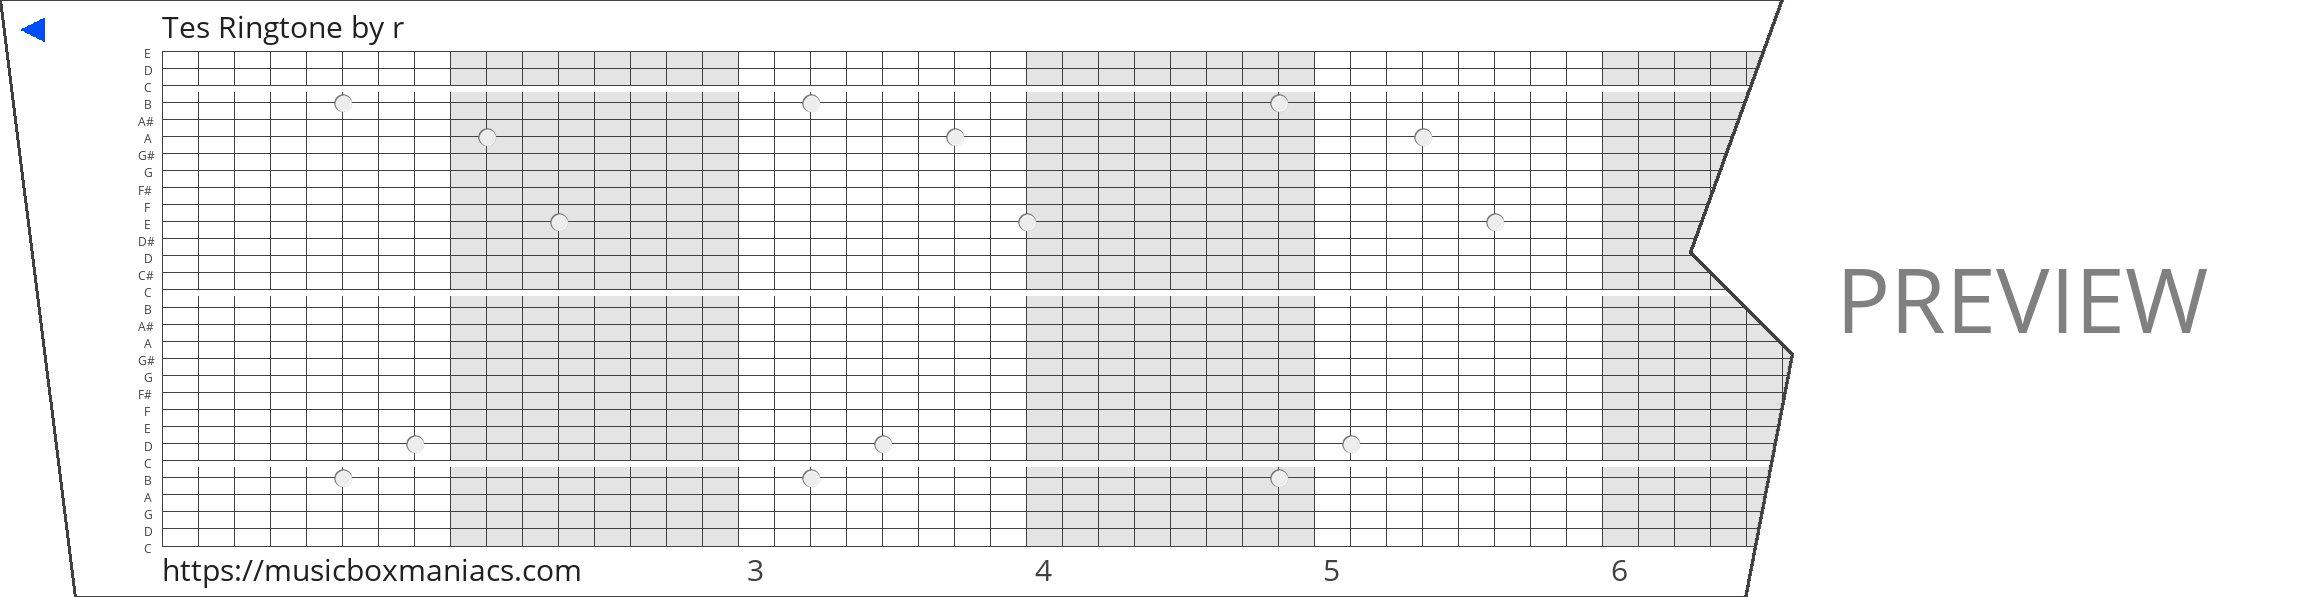 Tes Ringtone 30 note music box paper strip